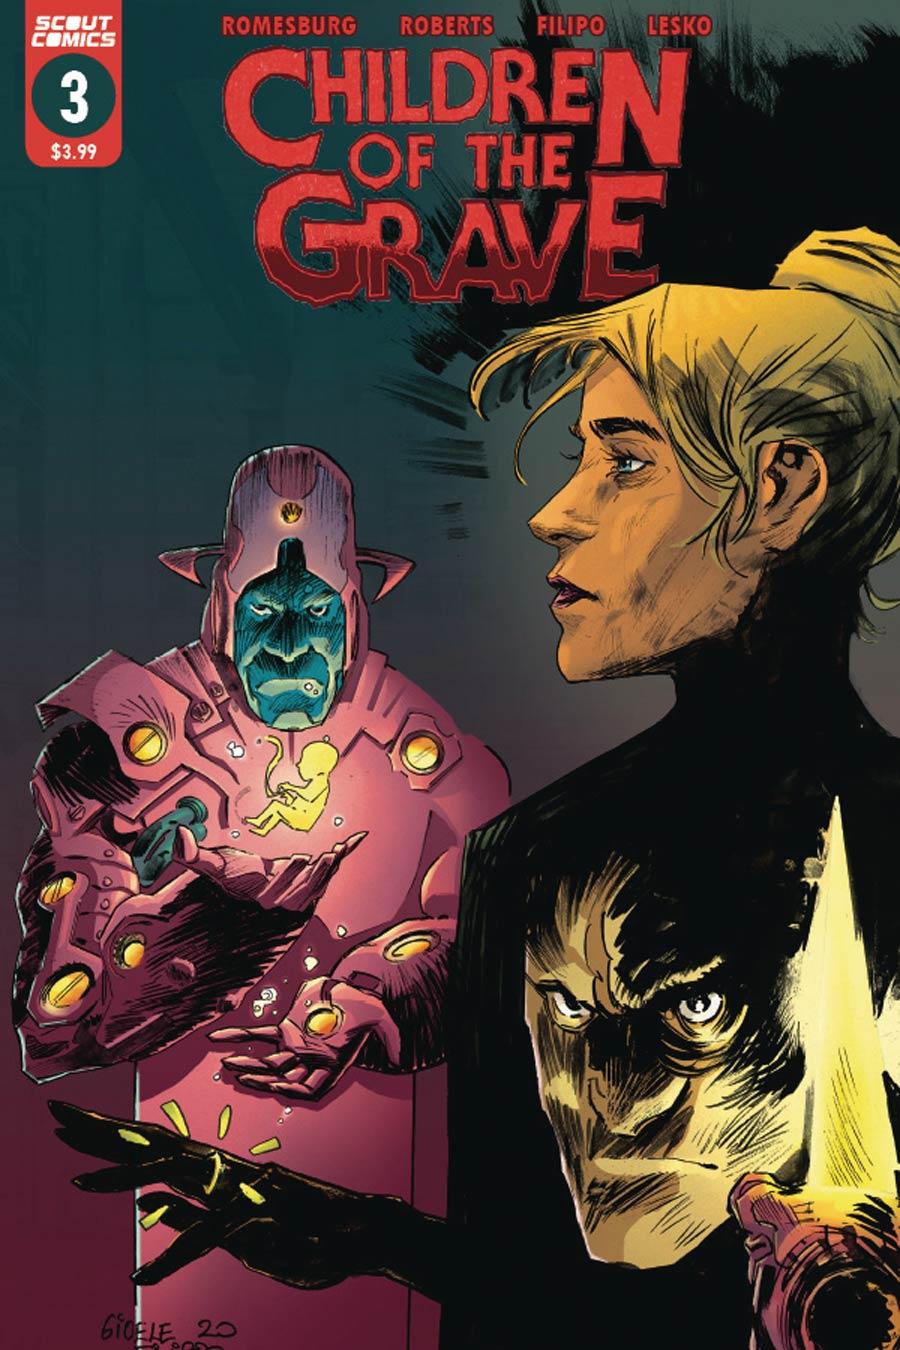 Children Of The Grave (Scout Comics) #3